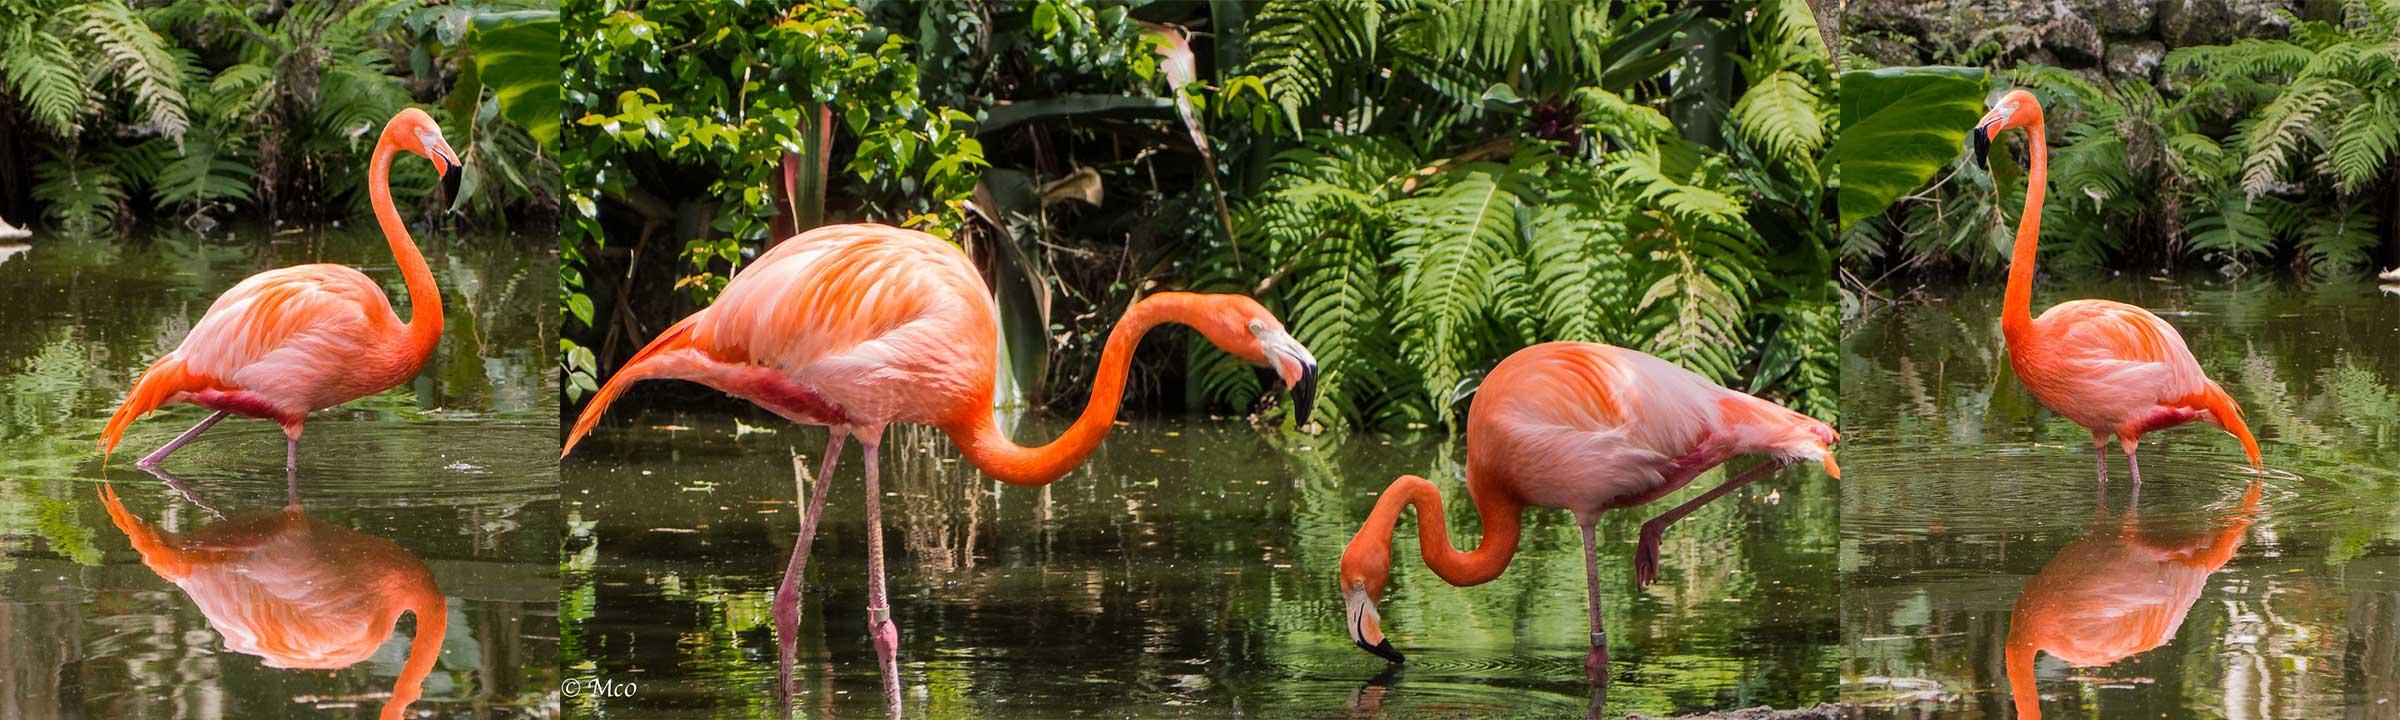 banner-flamingo